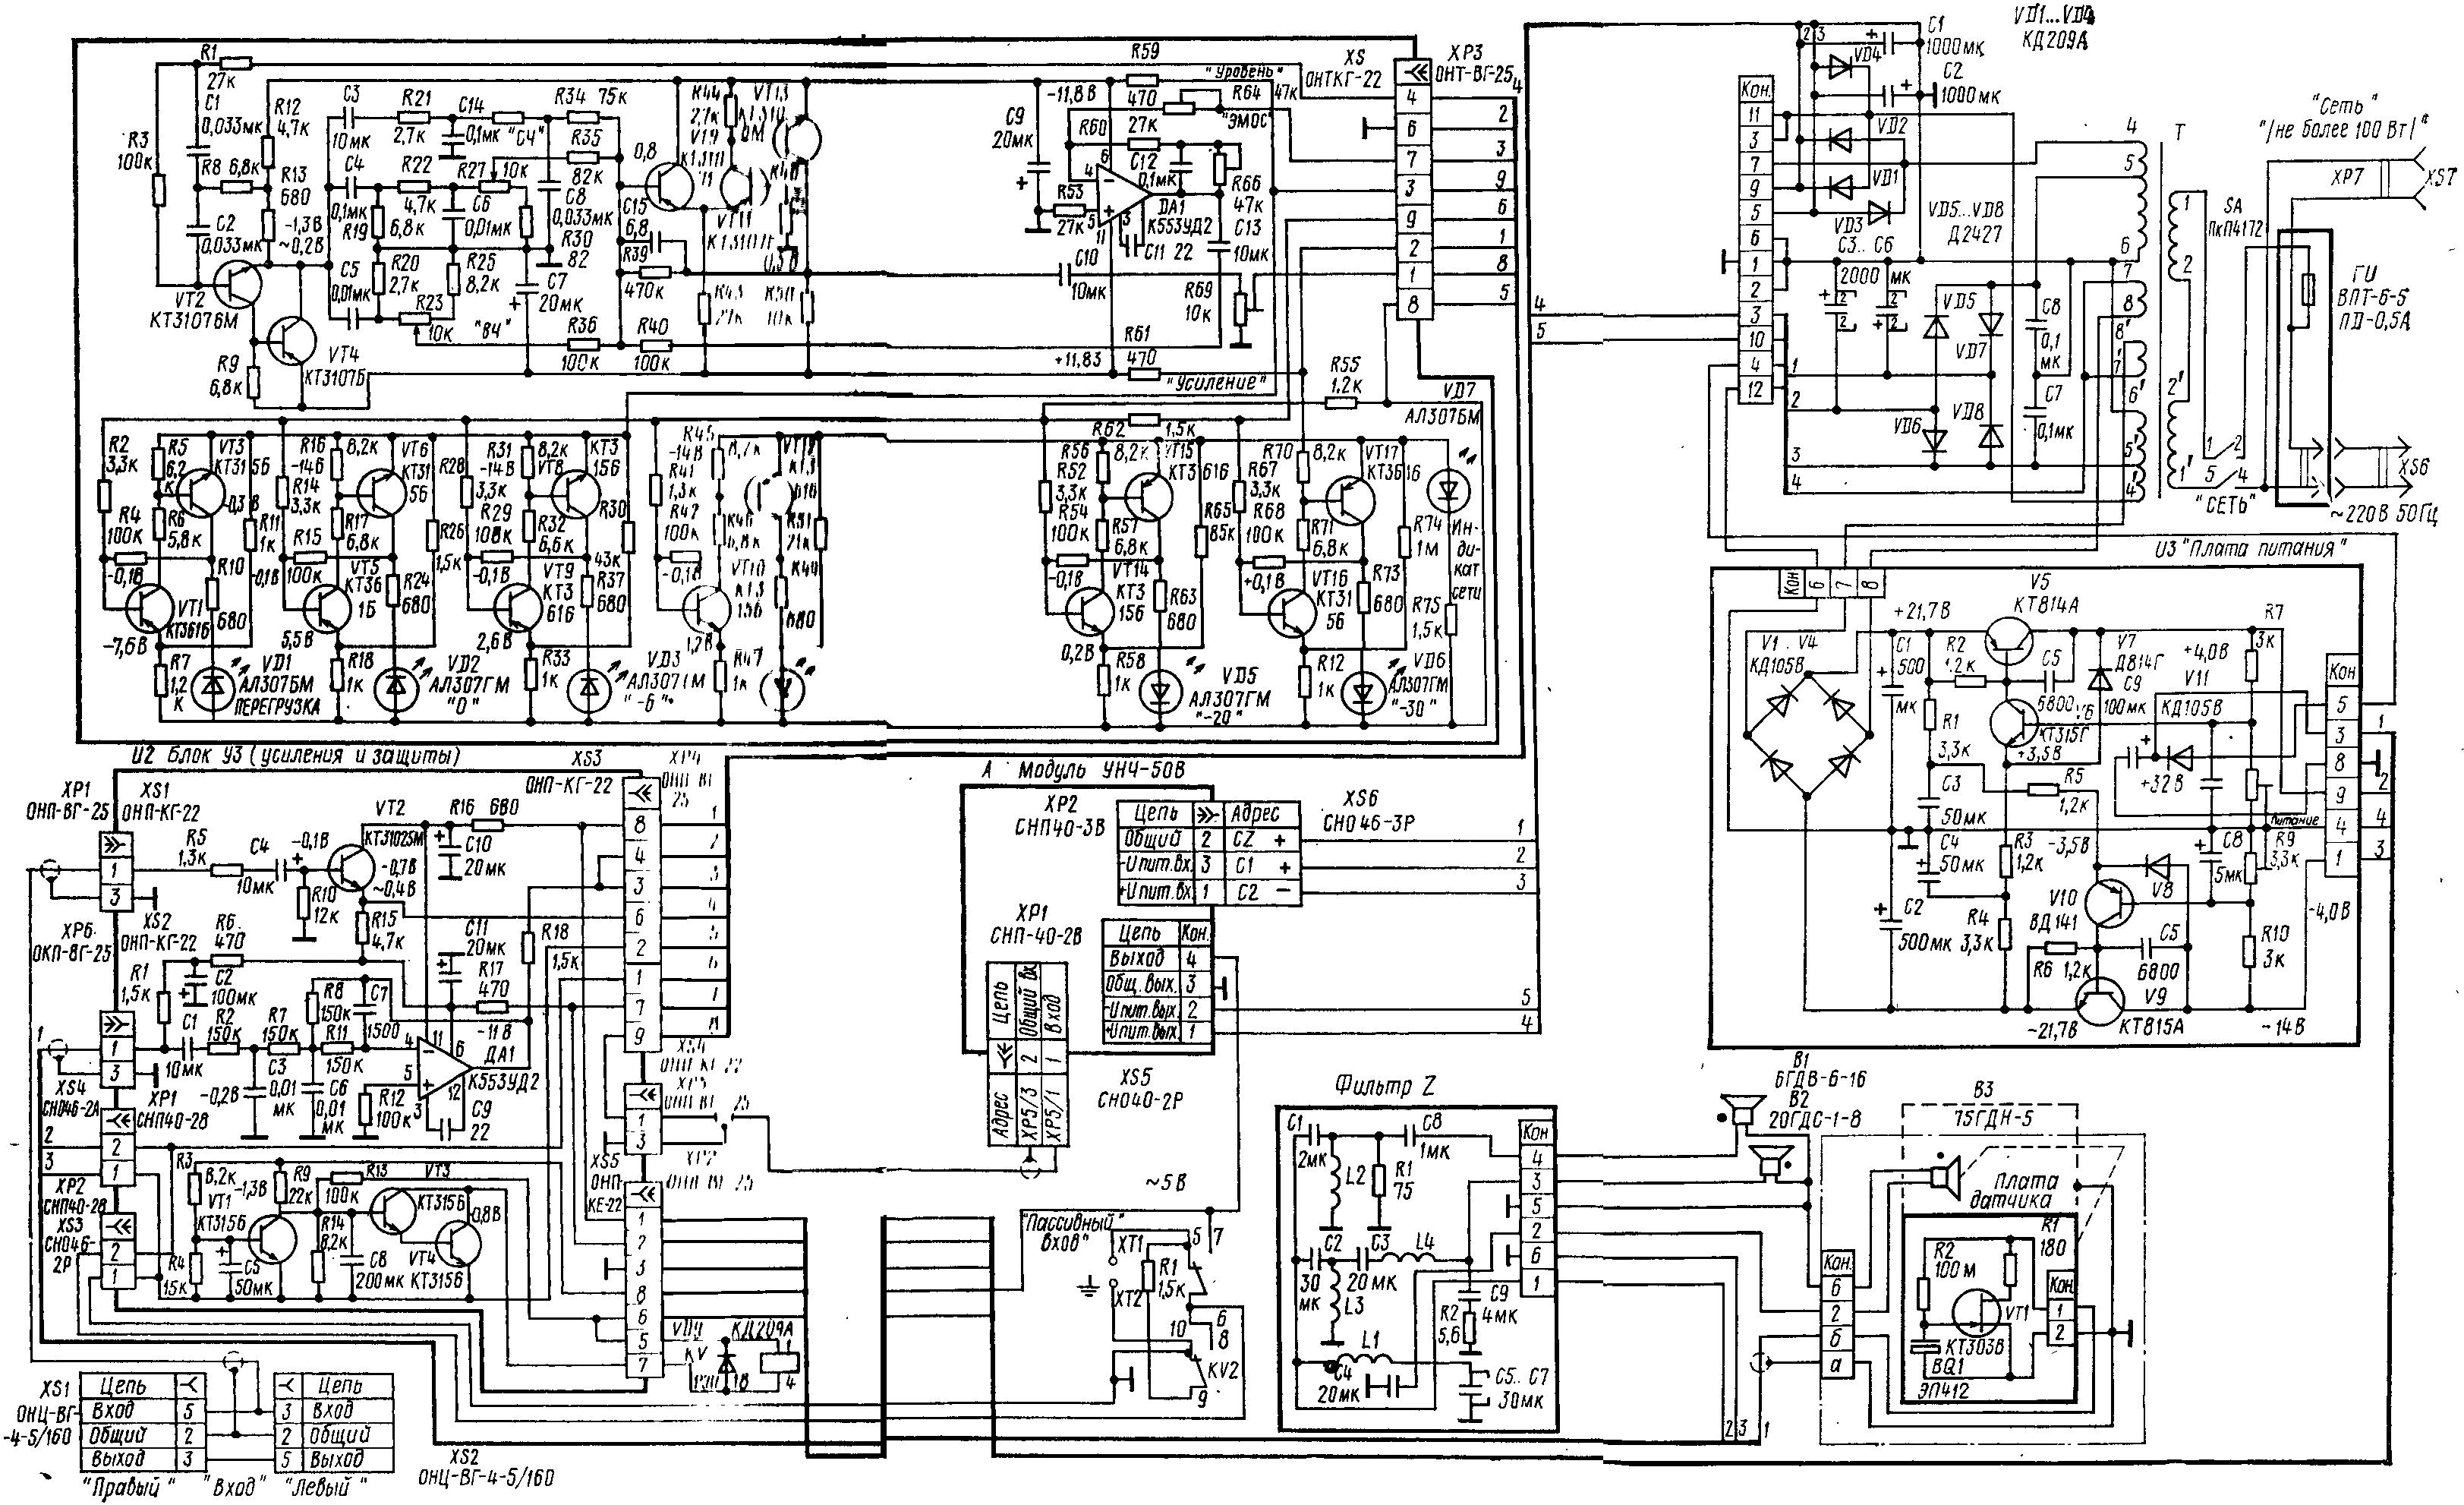 Схема колонок радиотехника